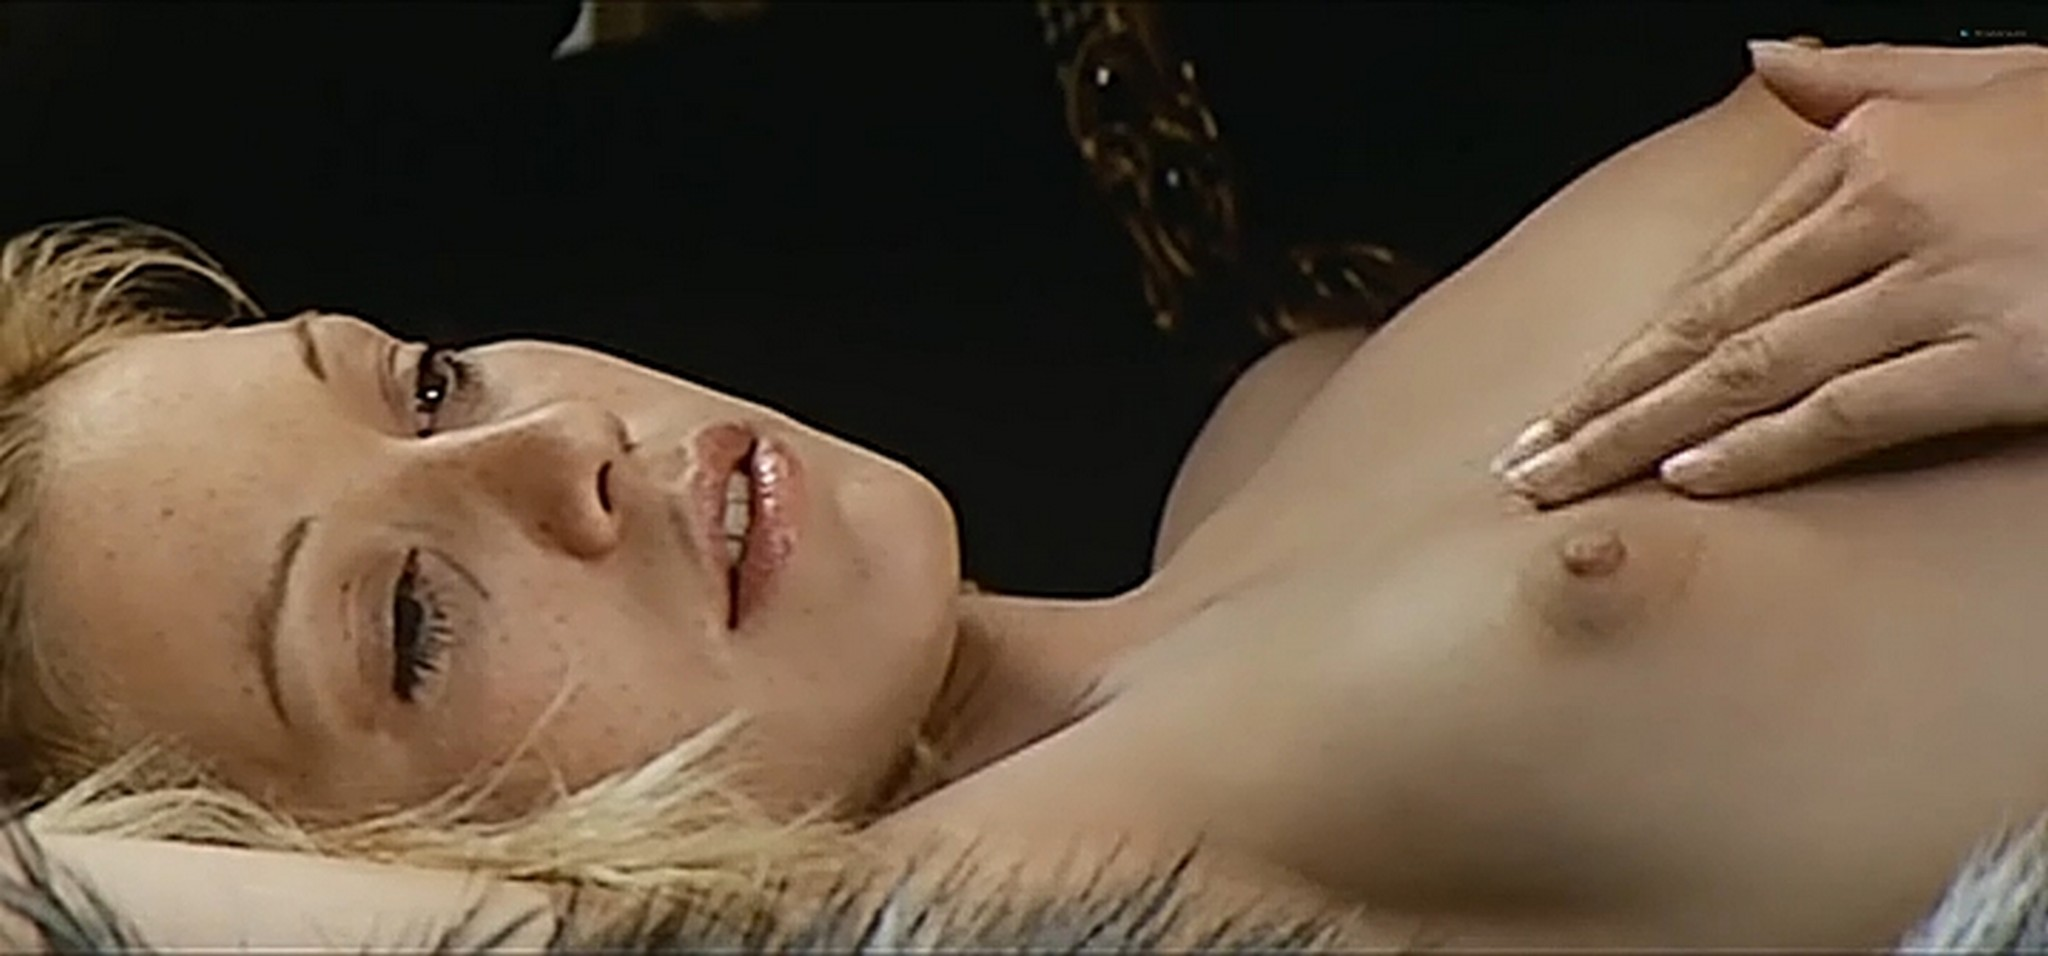 Anicee Alvina nude full frontal Sylvia Kristel and others nude Le jeu avec le feu FR 1975 DVDrip 15